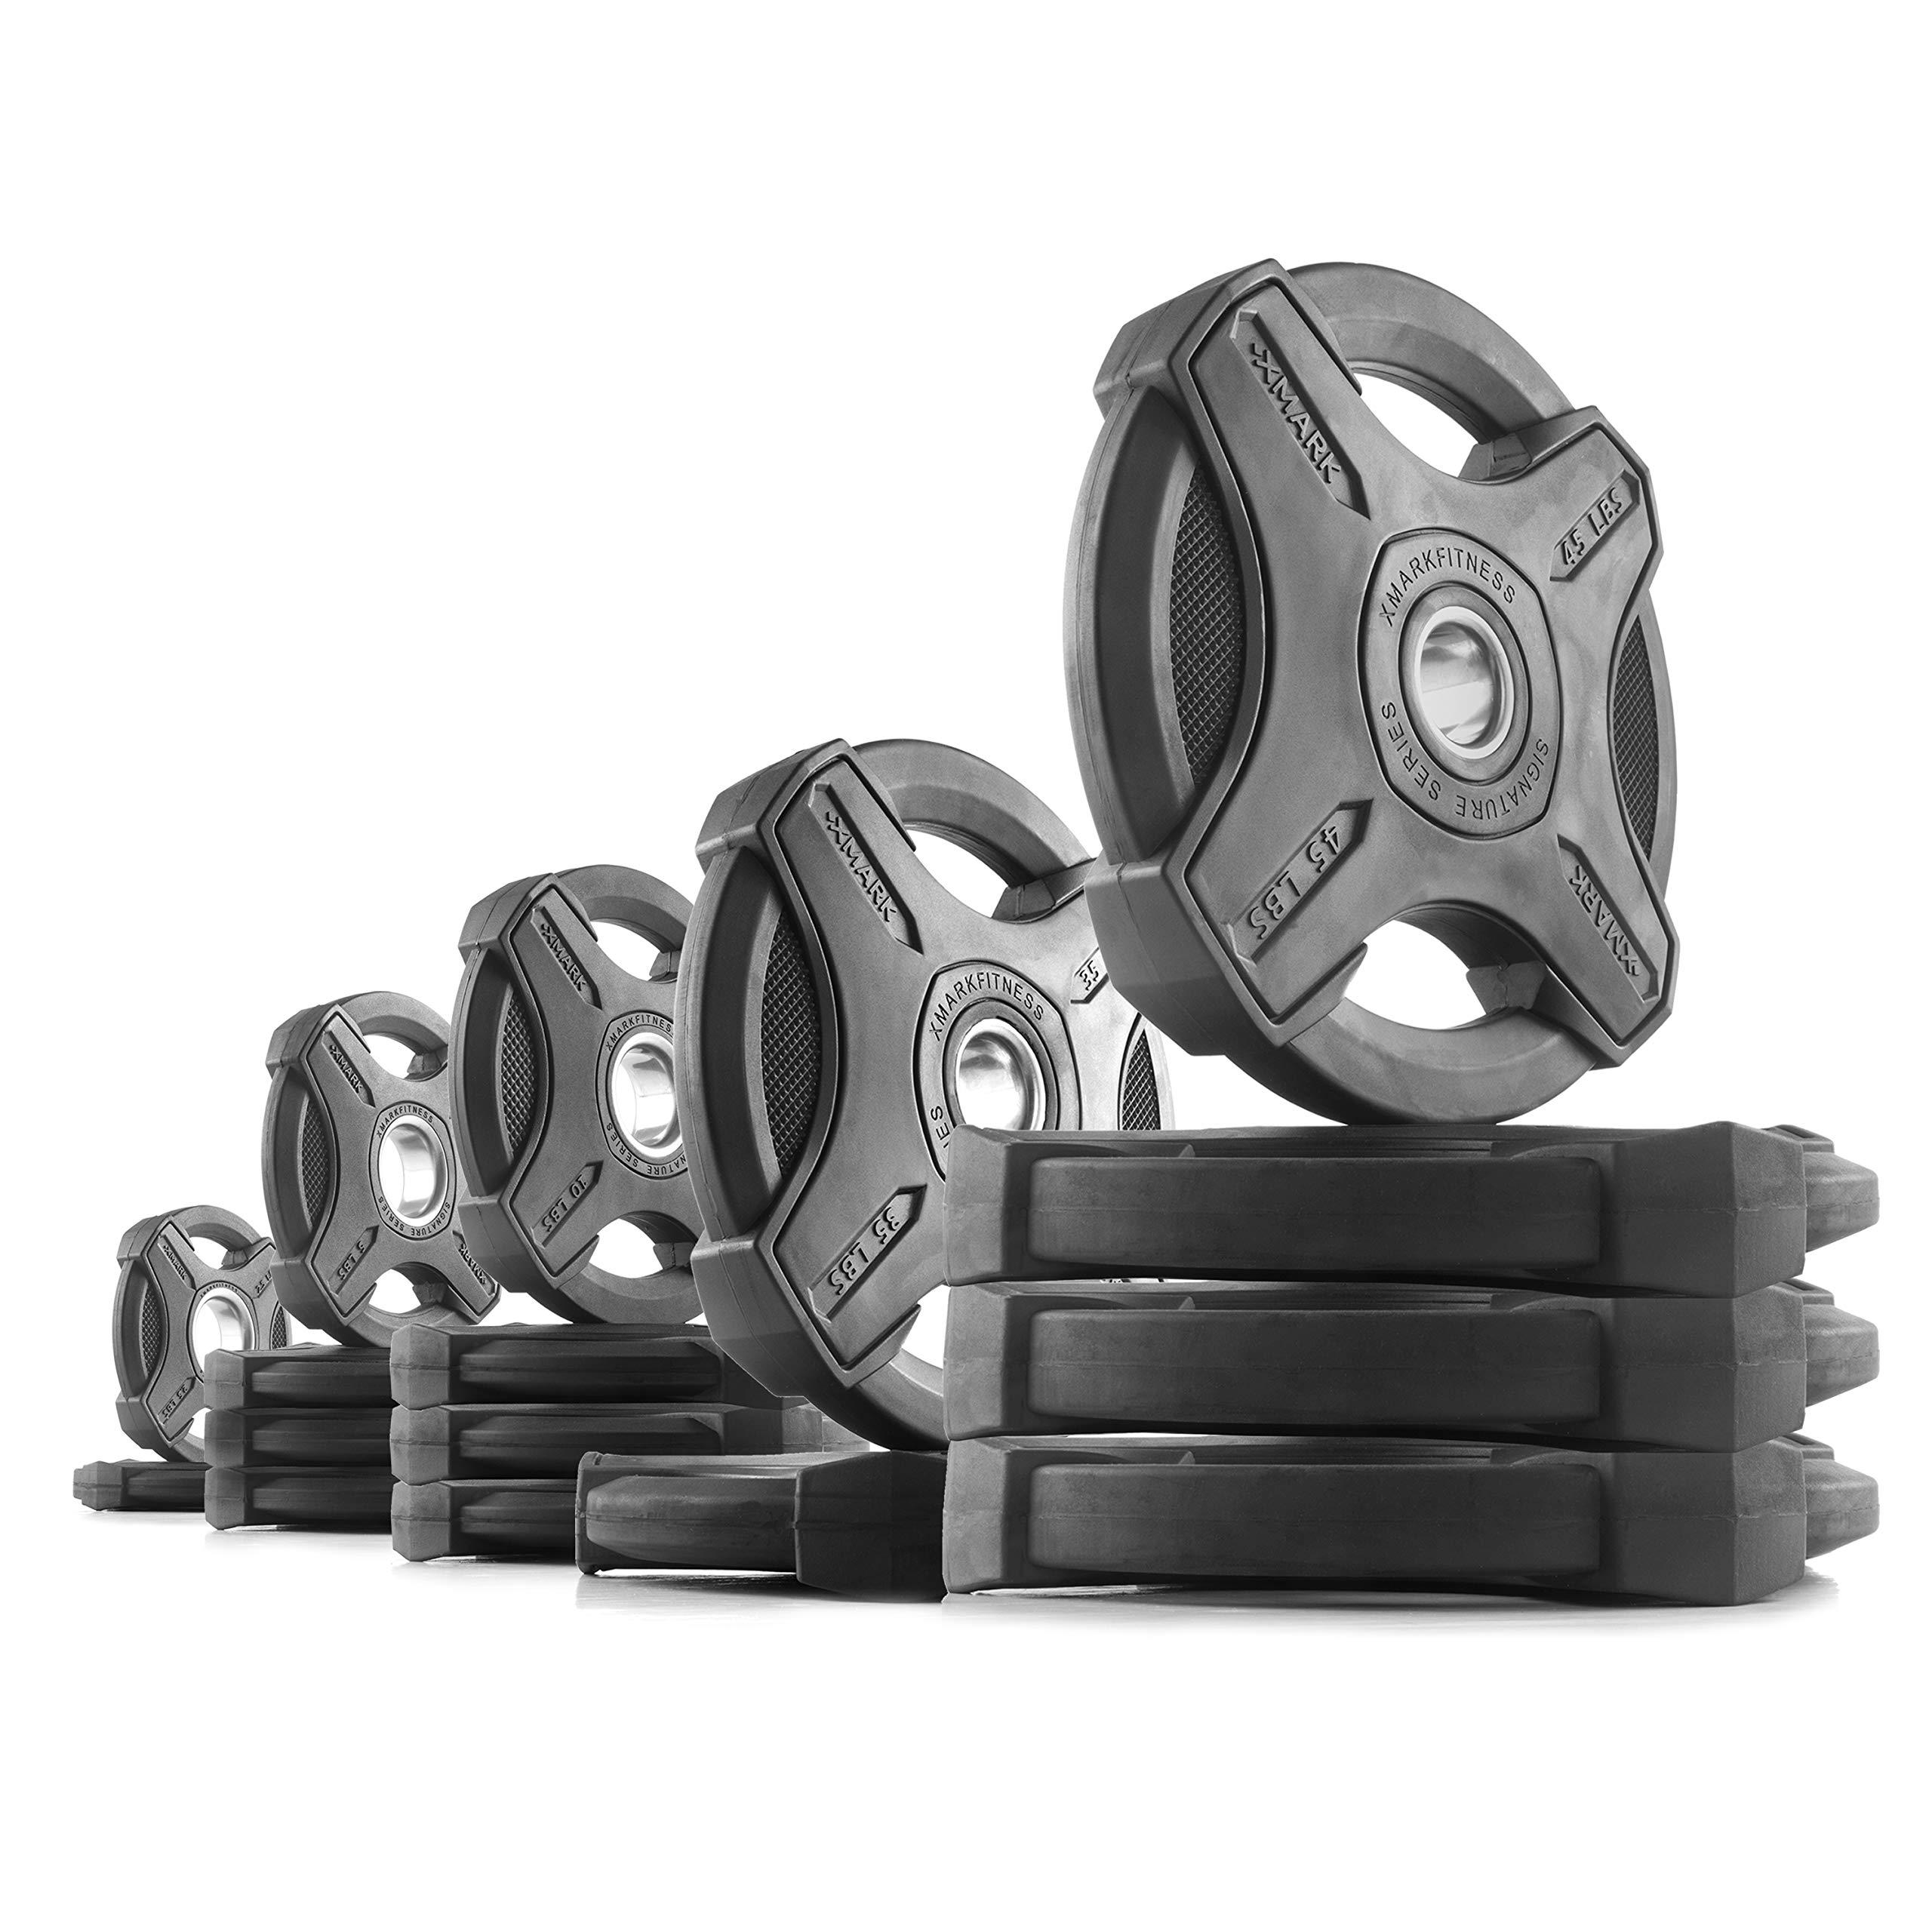 XMark 315 lb Set Signature Plates, One-Year Warranty, Olympic Weight Plates, Cutting-Edge Design